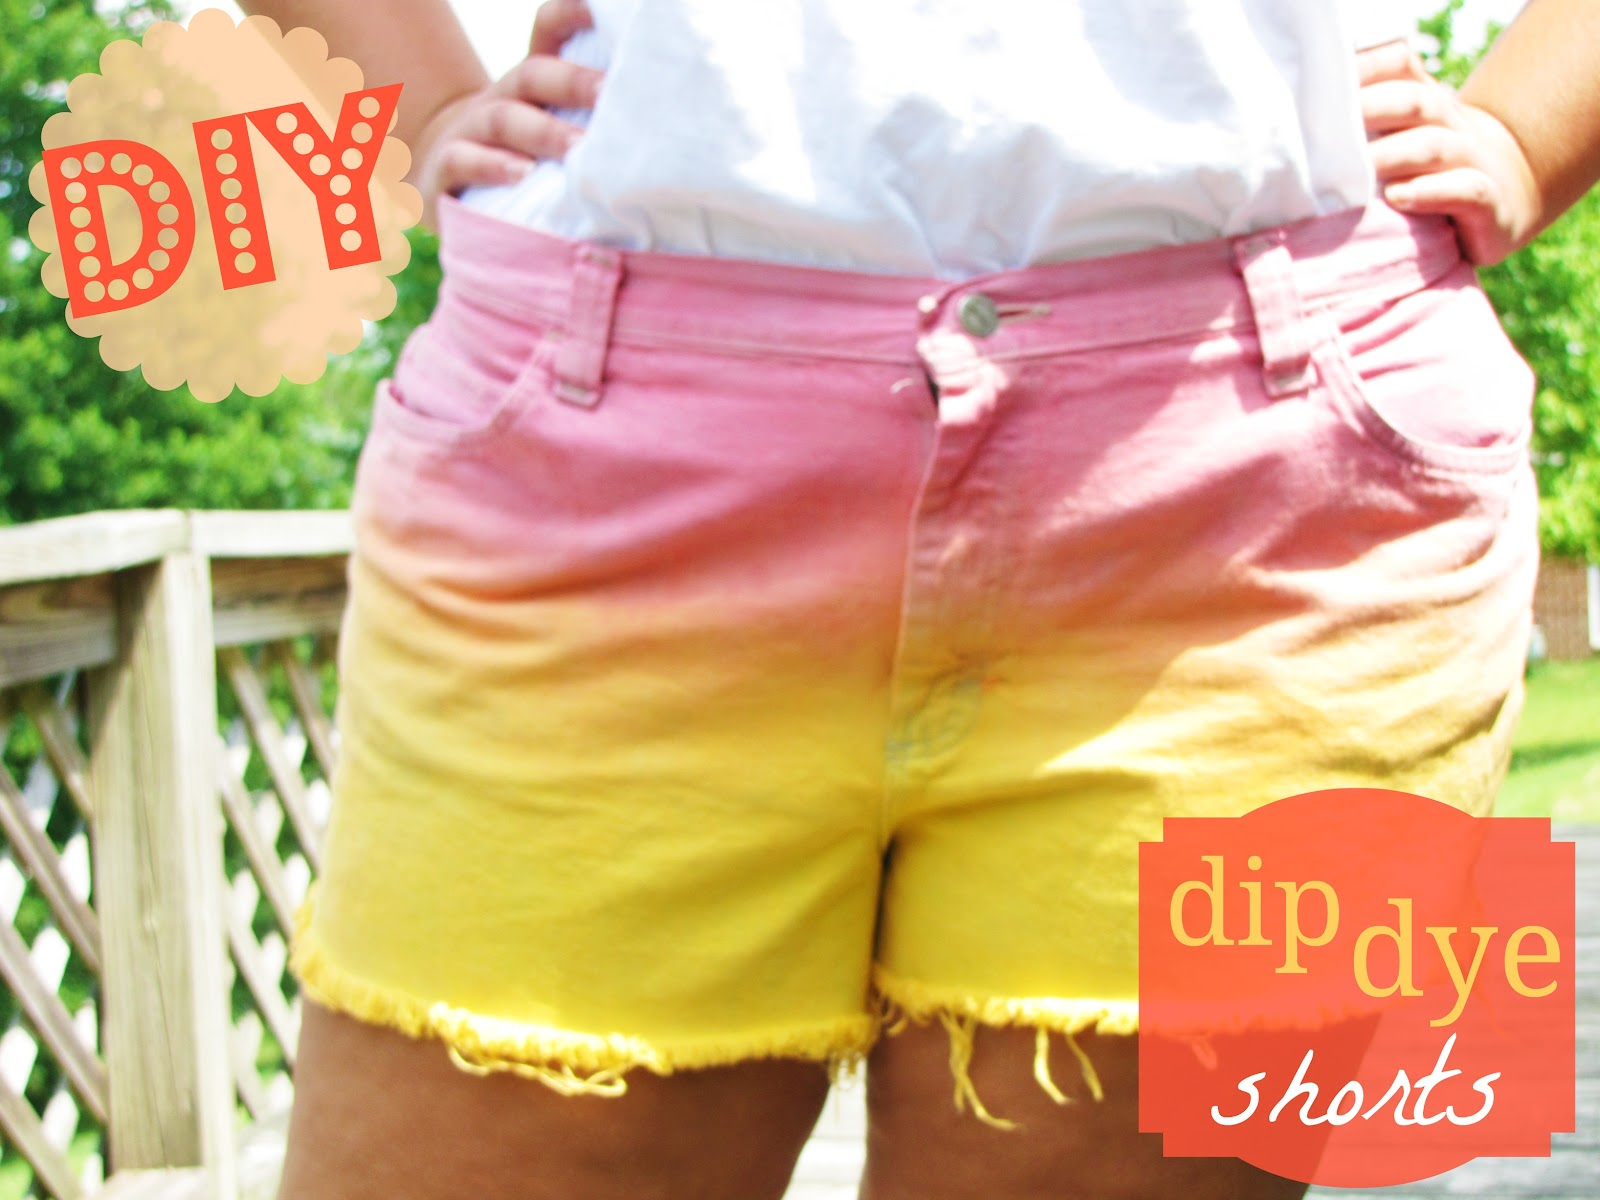 Floral Anchors: DIY Dip Dye Shorts